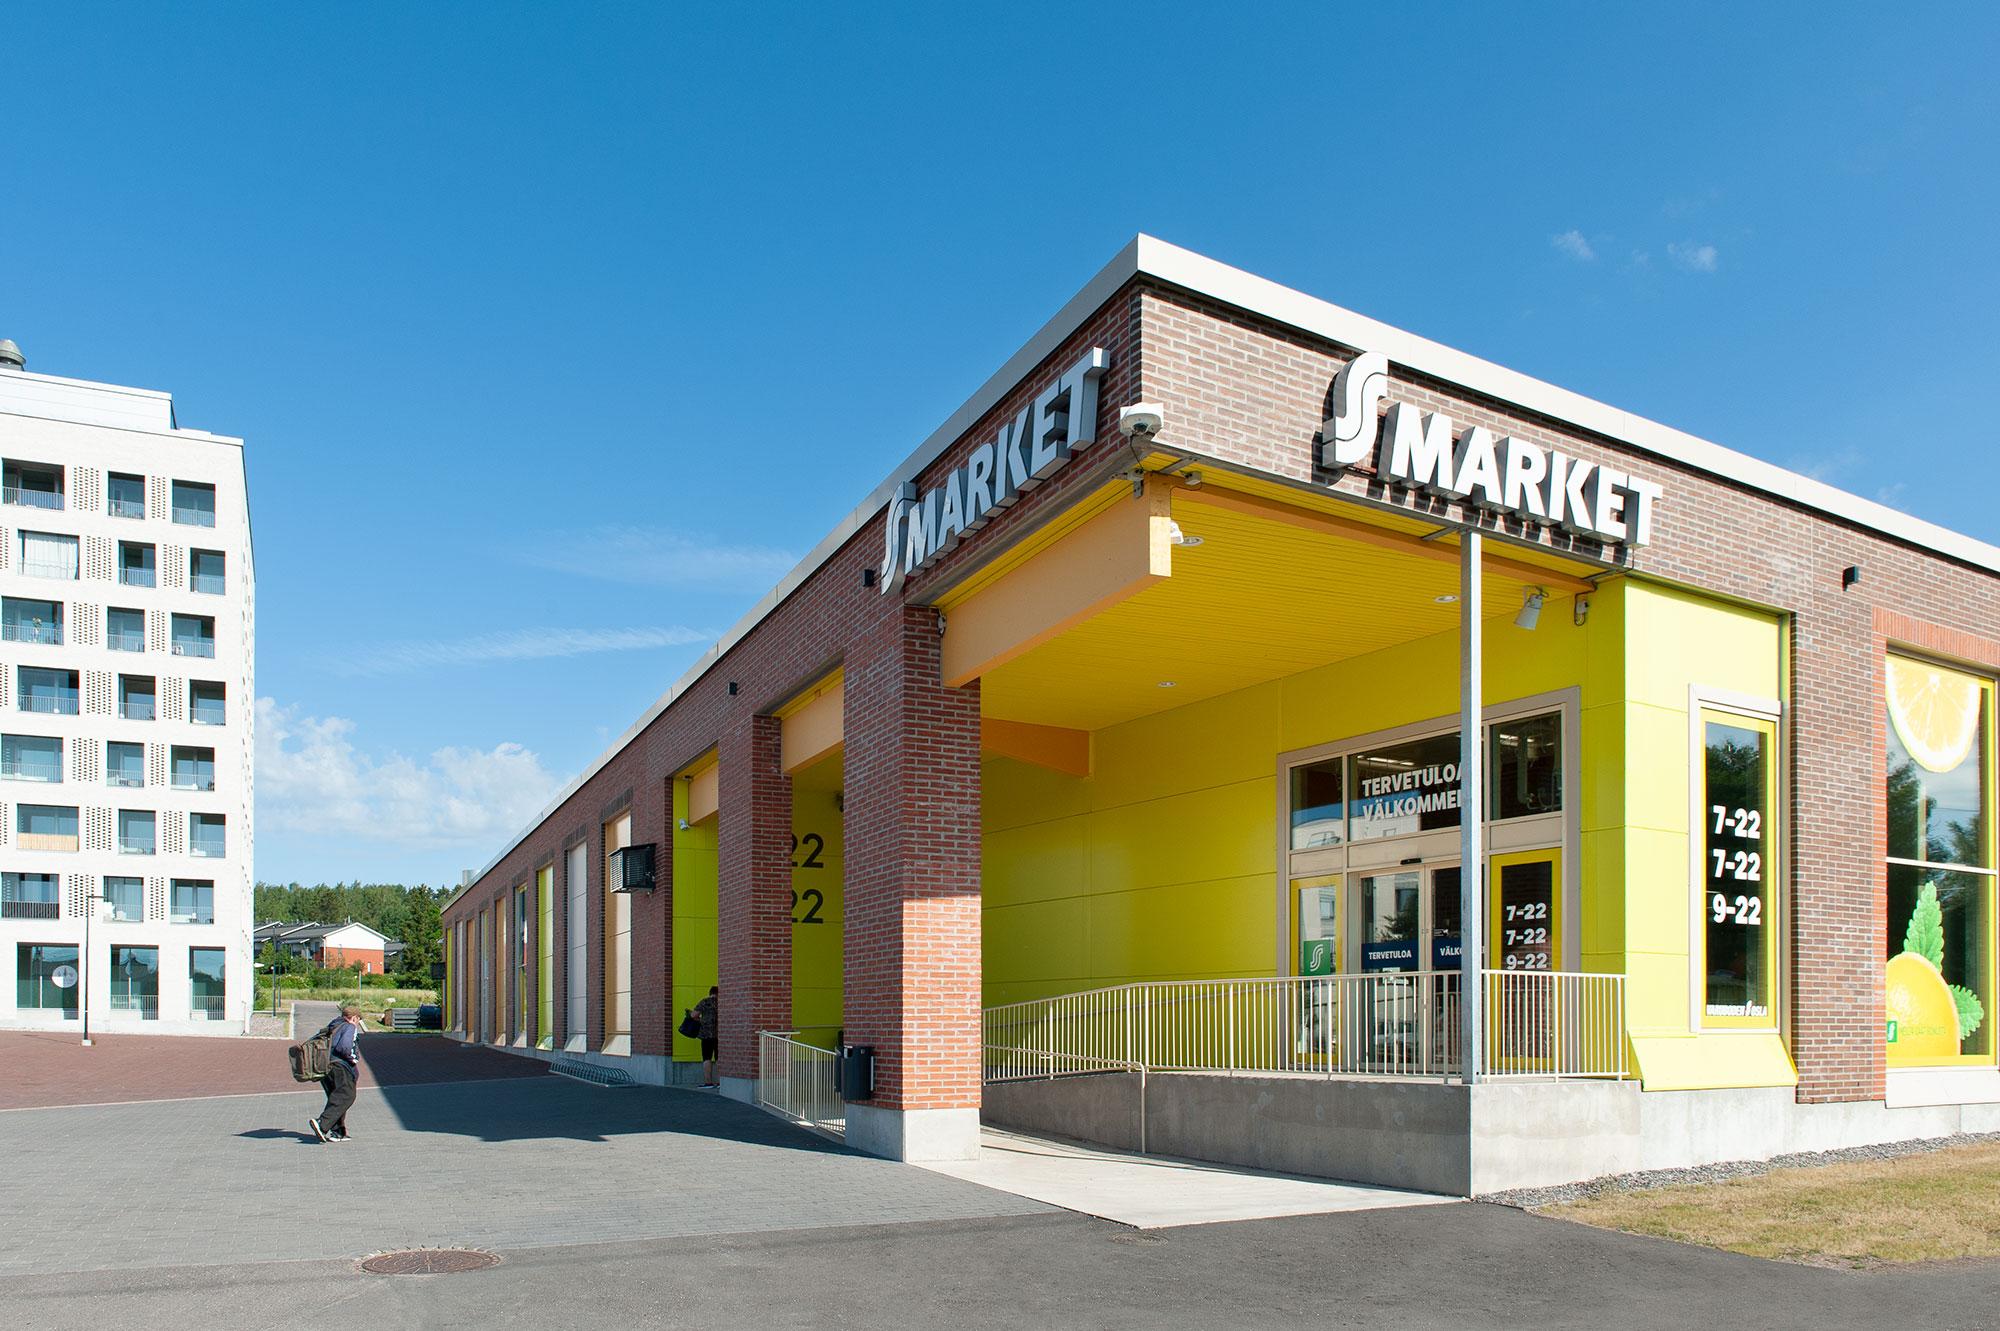 S-Market Masala